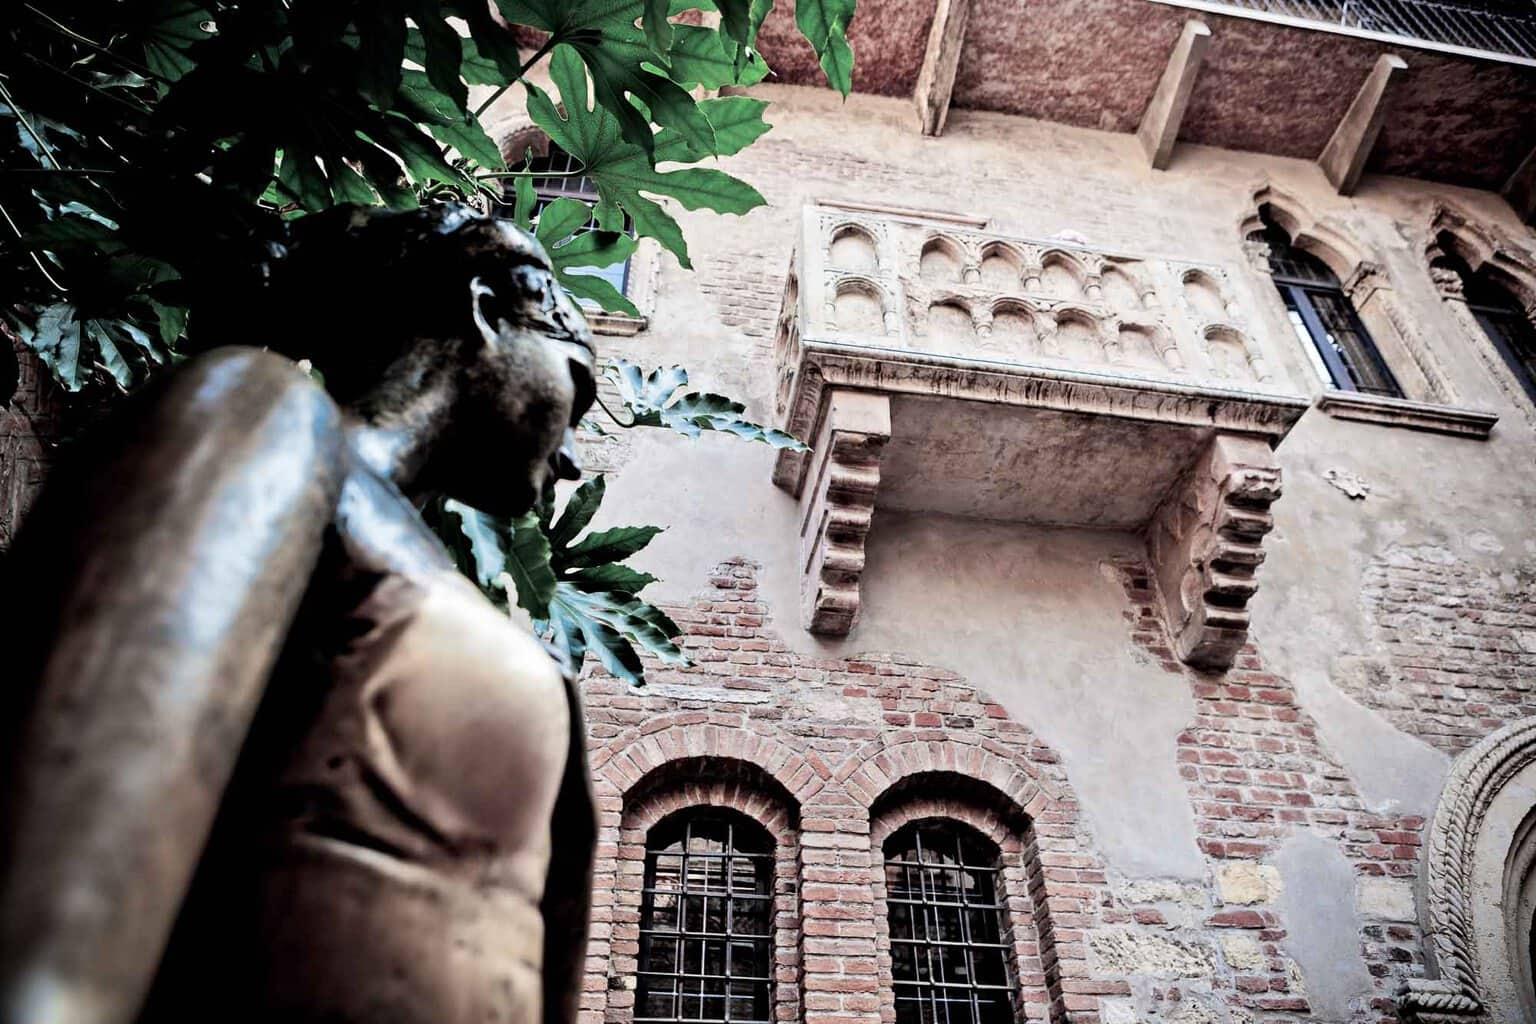 Turismo e arte a Verona, Casa di Giulietta